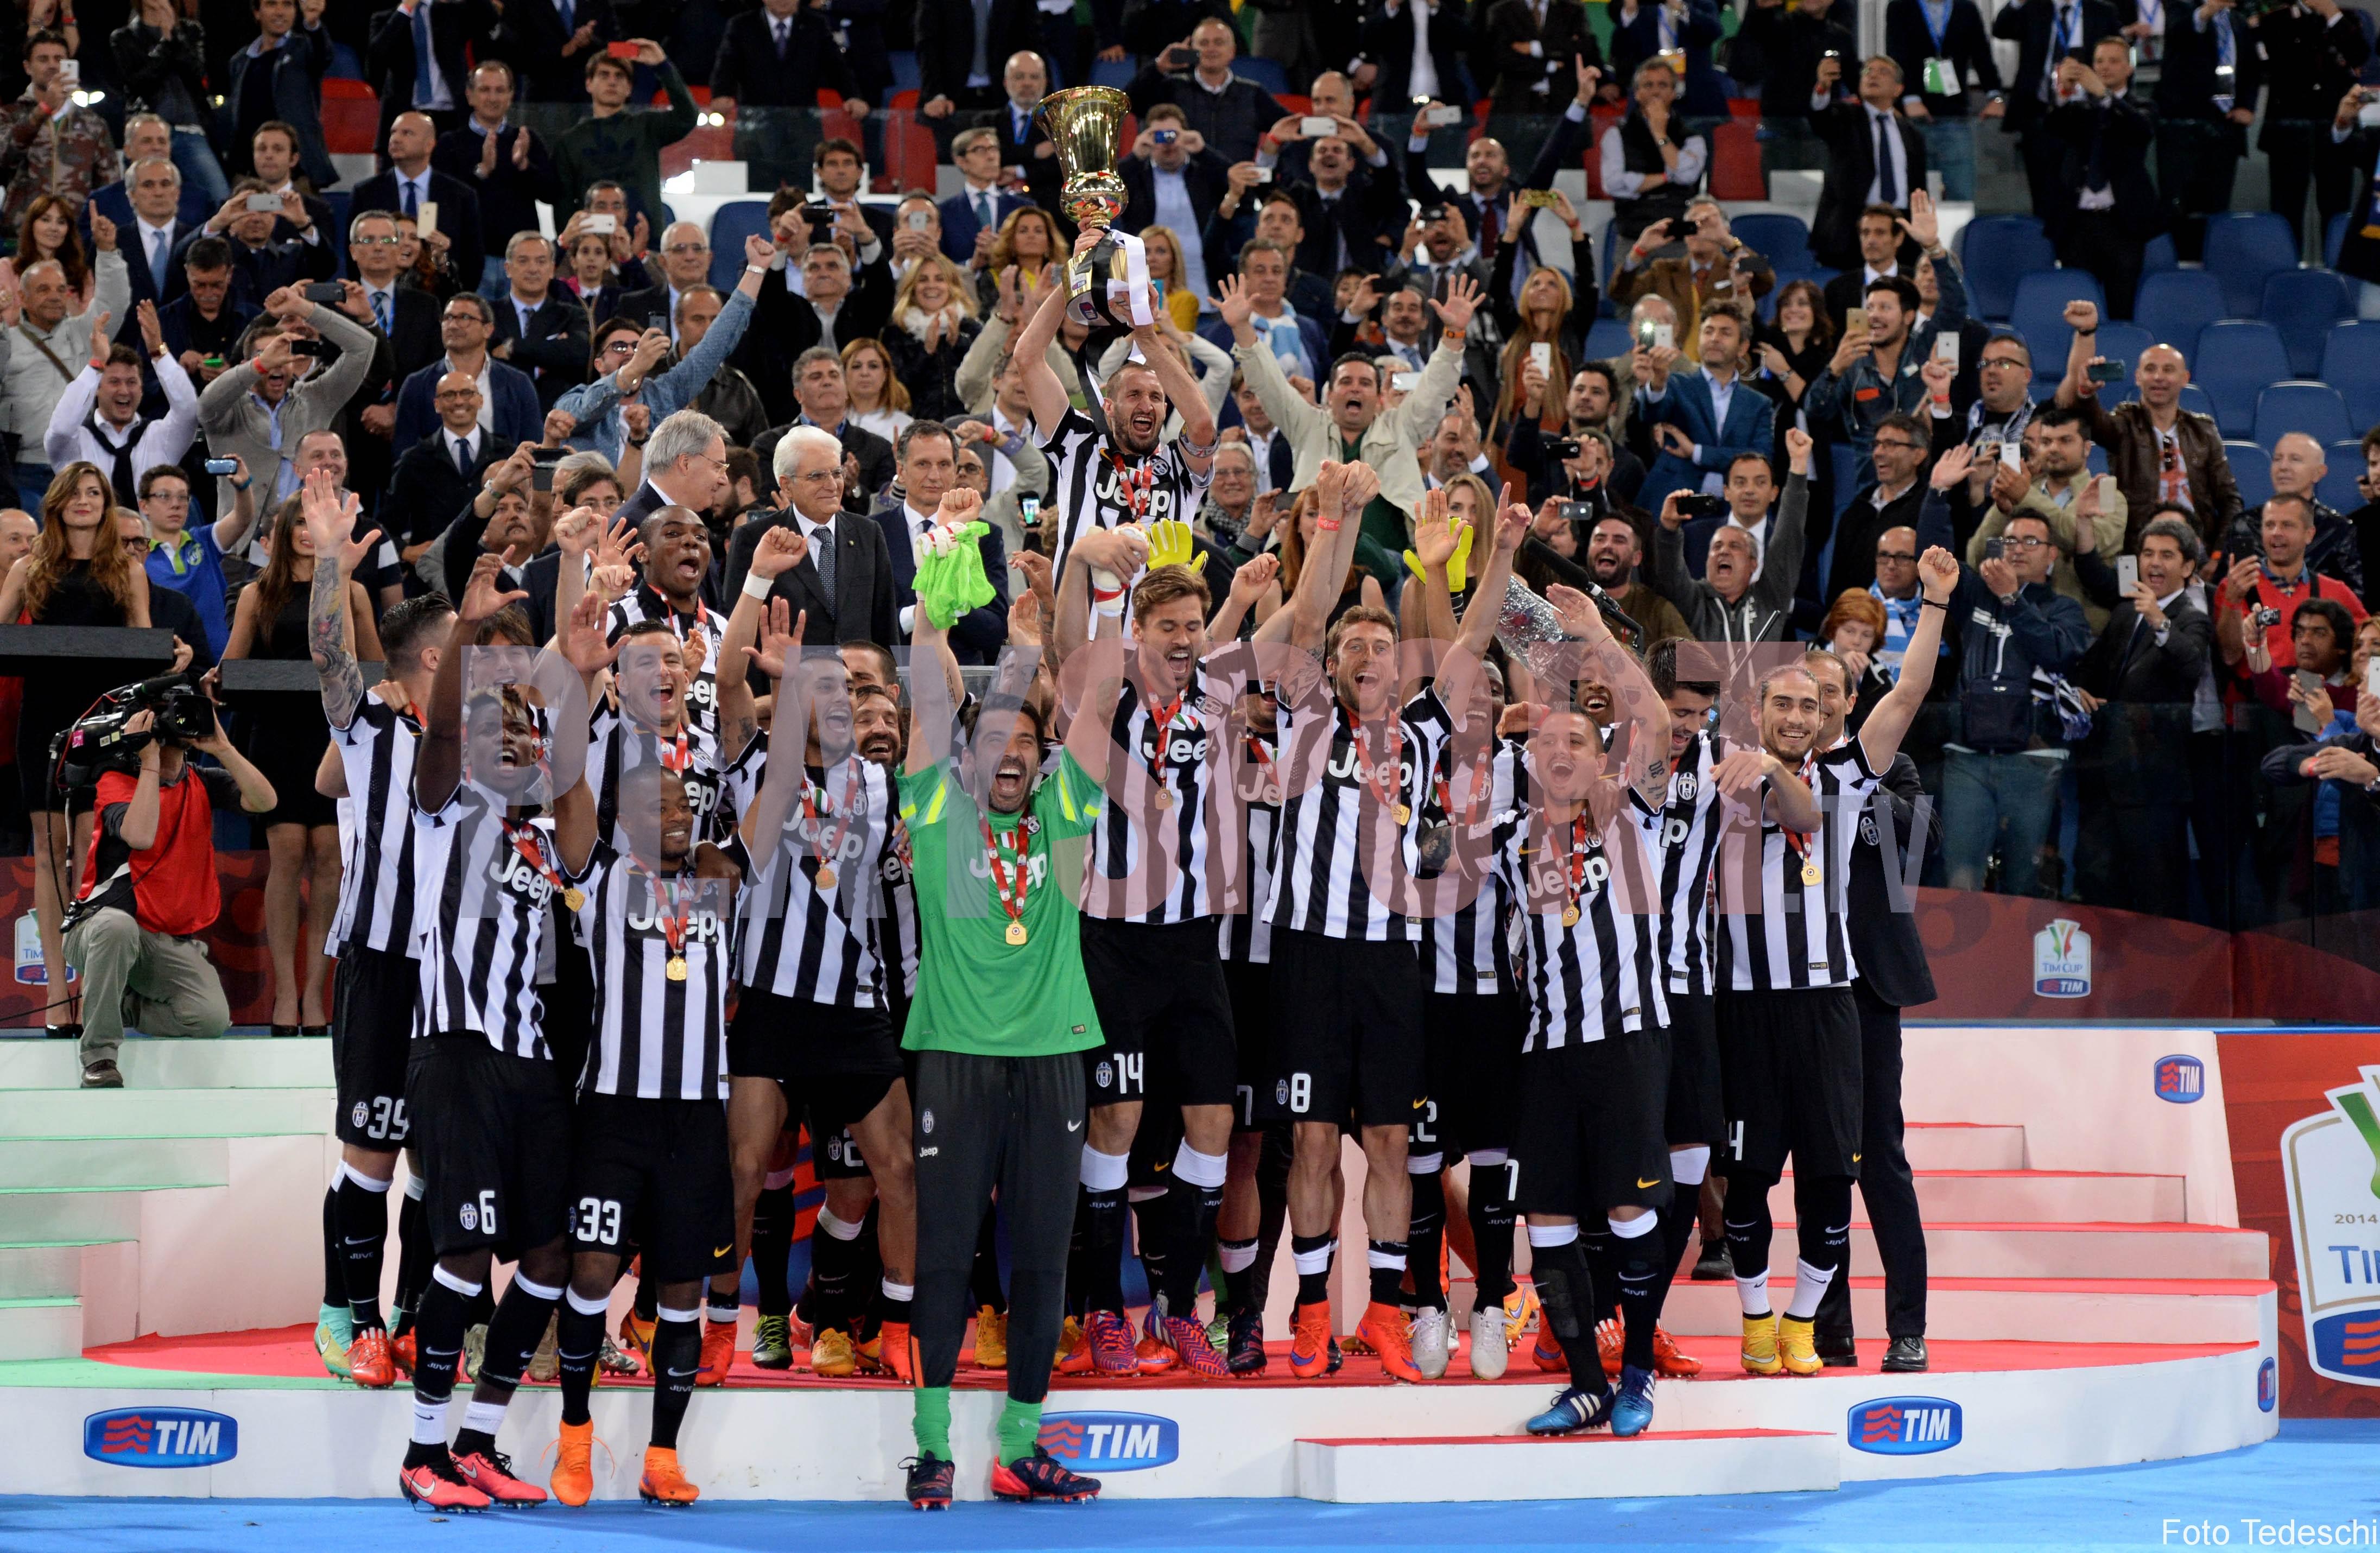 Juve-Lazio 2-1 dts: Madama suona la decima. Fotocronaca, video, interviste